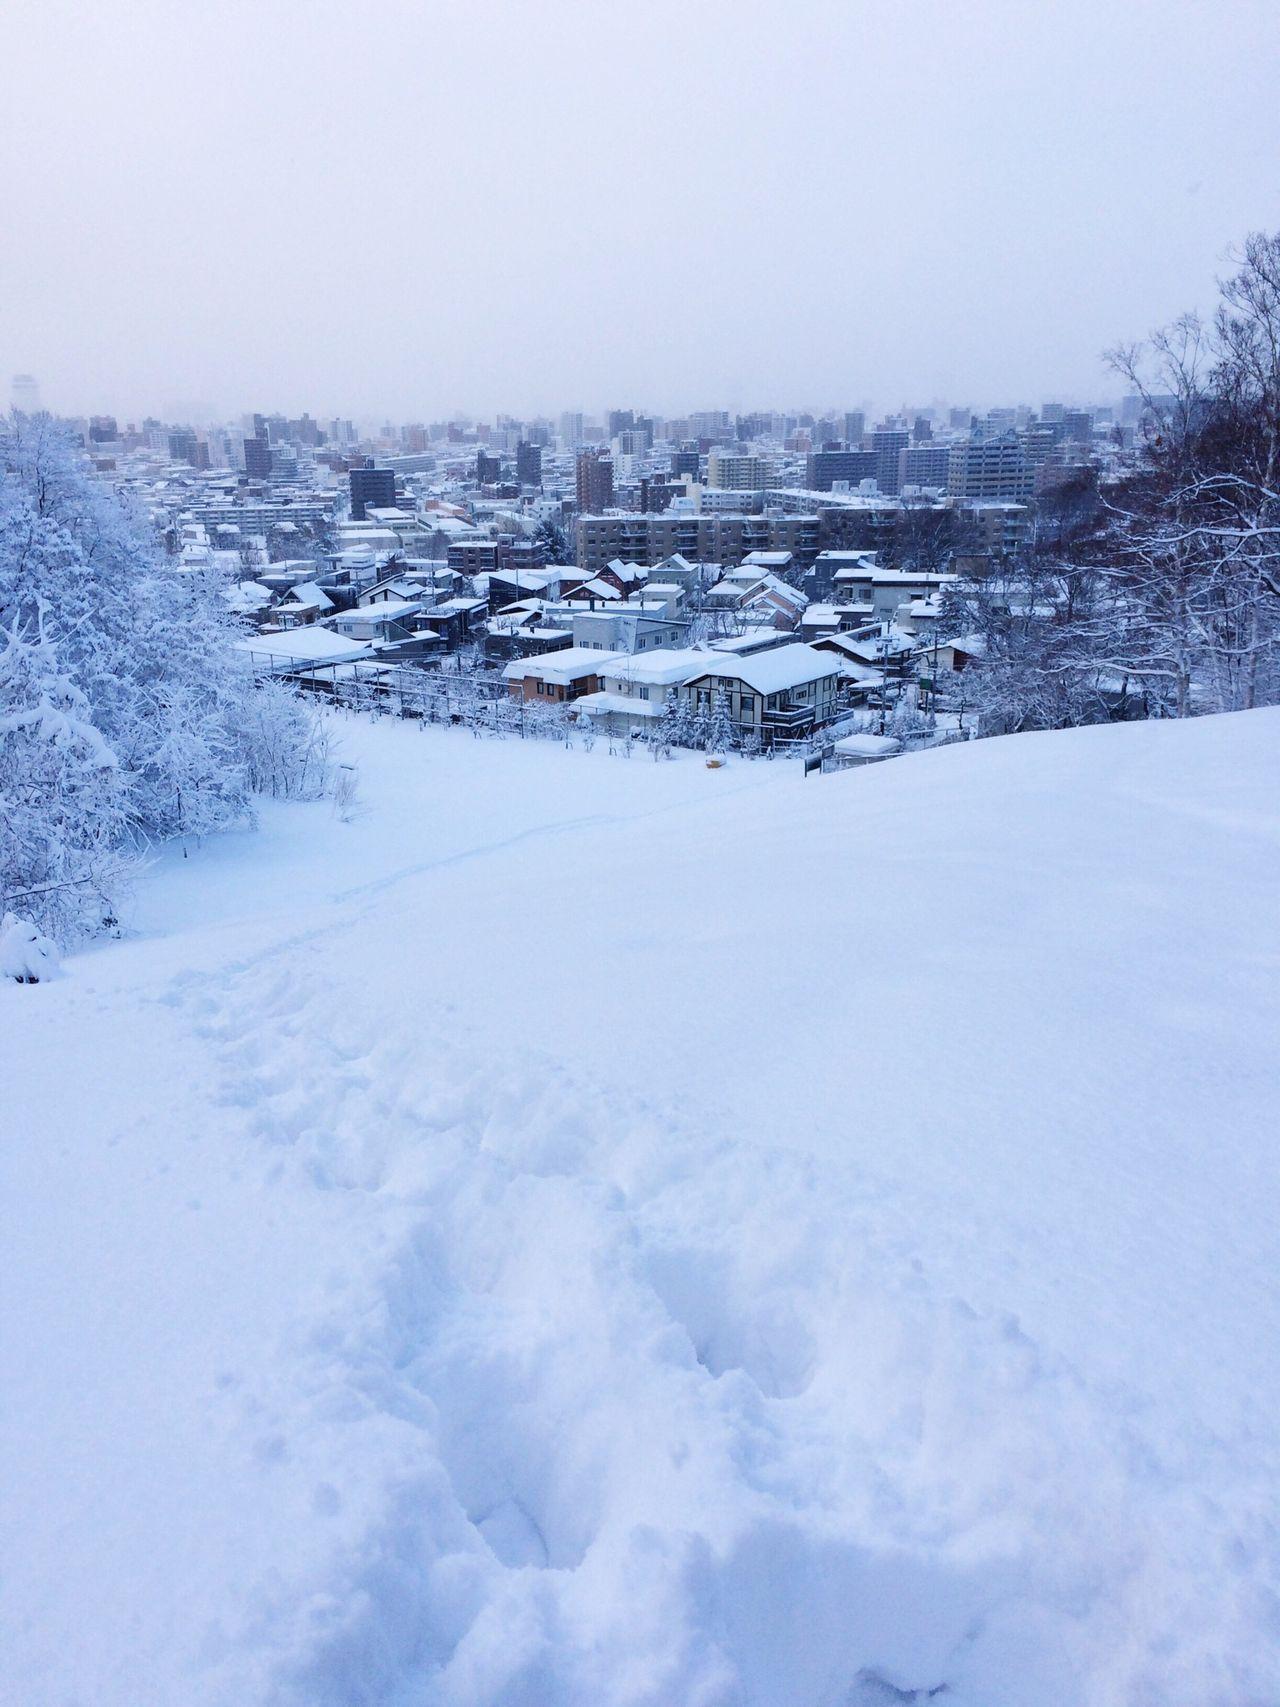 Snow Snow ❄ Park Mountain Hills White Footprints Slope City Winter Sapporo Sapporo-shi Japan Nature EyeEm Nature Lover Eyeemphotography Asahiyama Park Landscape Eyeem Photography It's Cold Outside